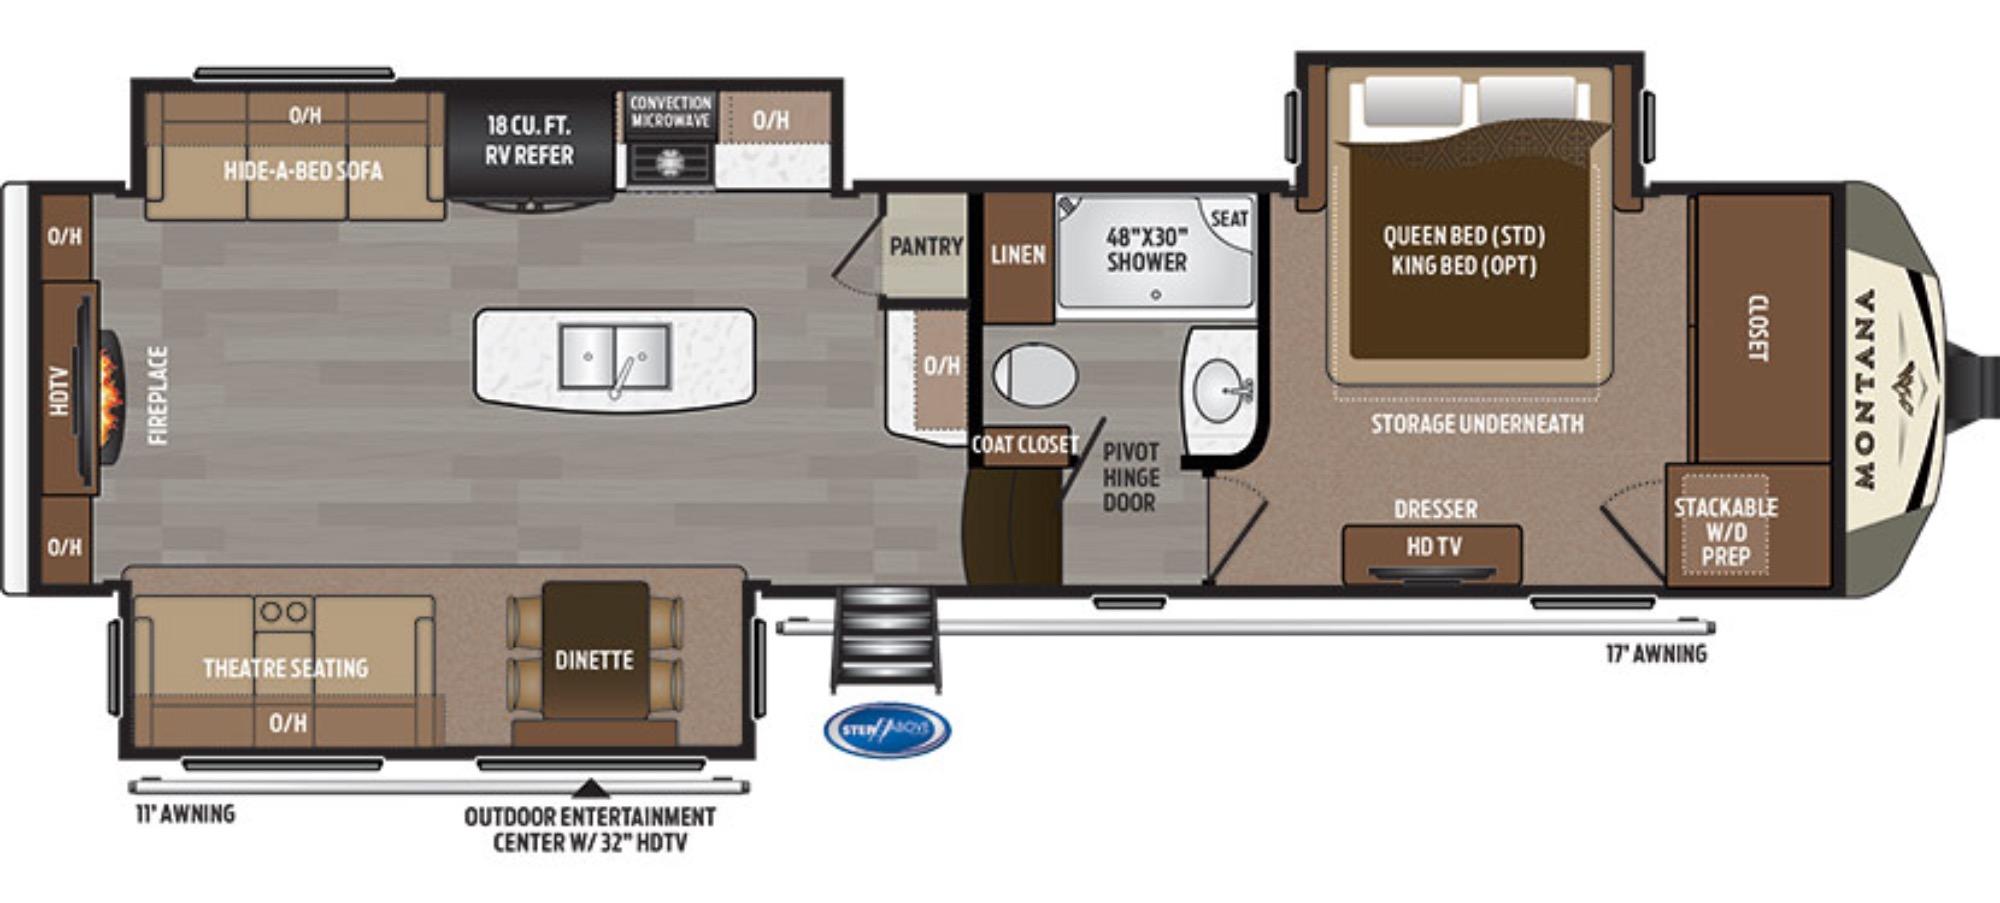 View Floor Plan for 2018 KEYSTONE MONTANA 3000RE